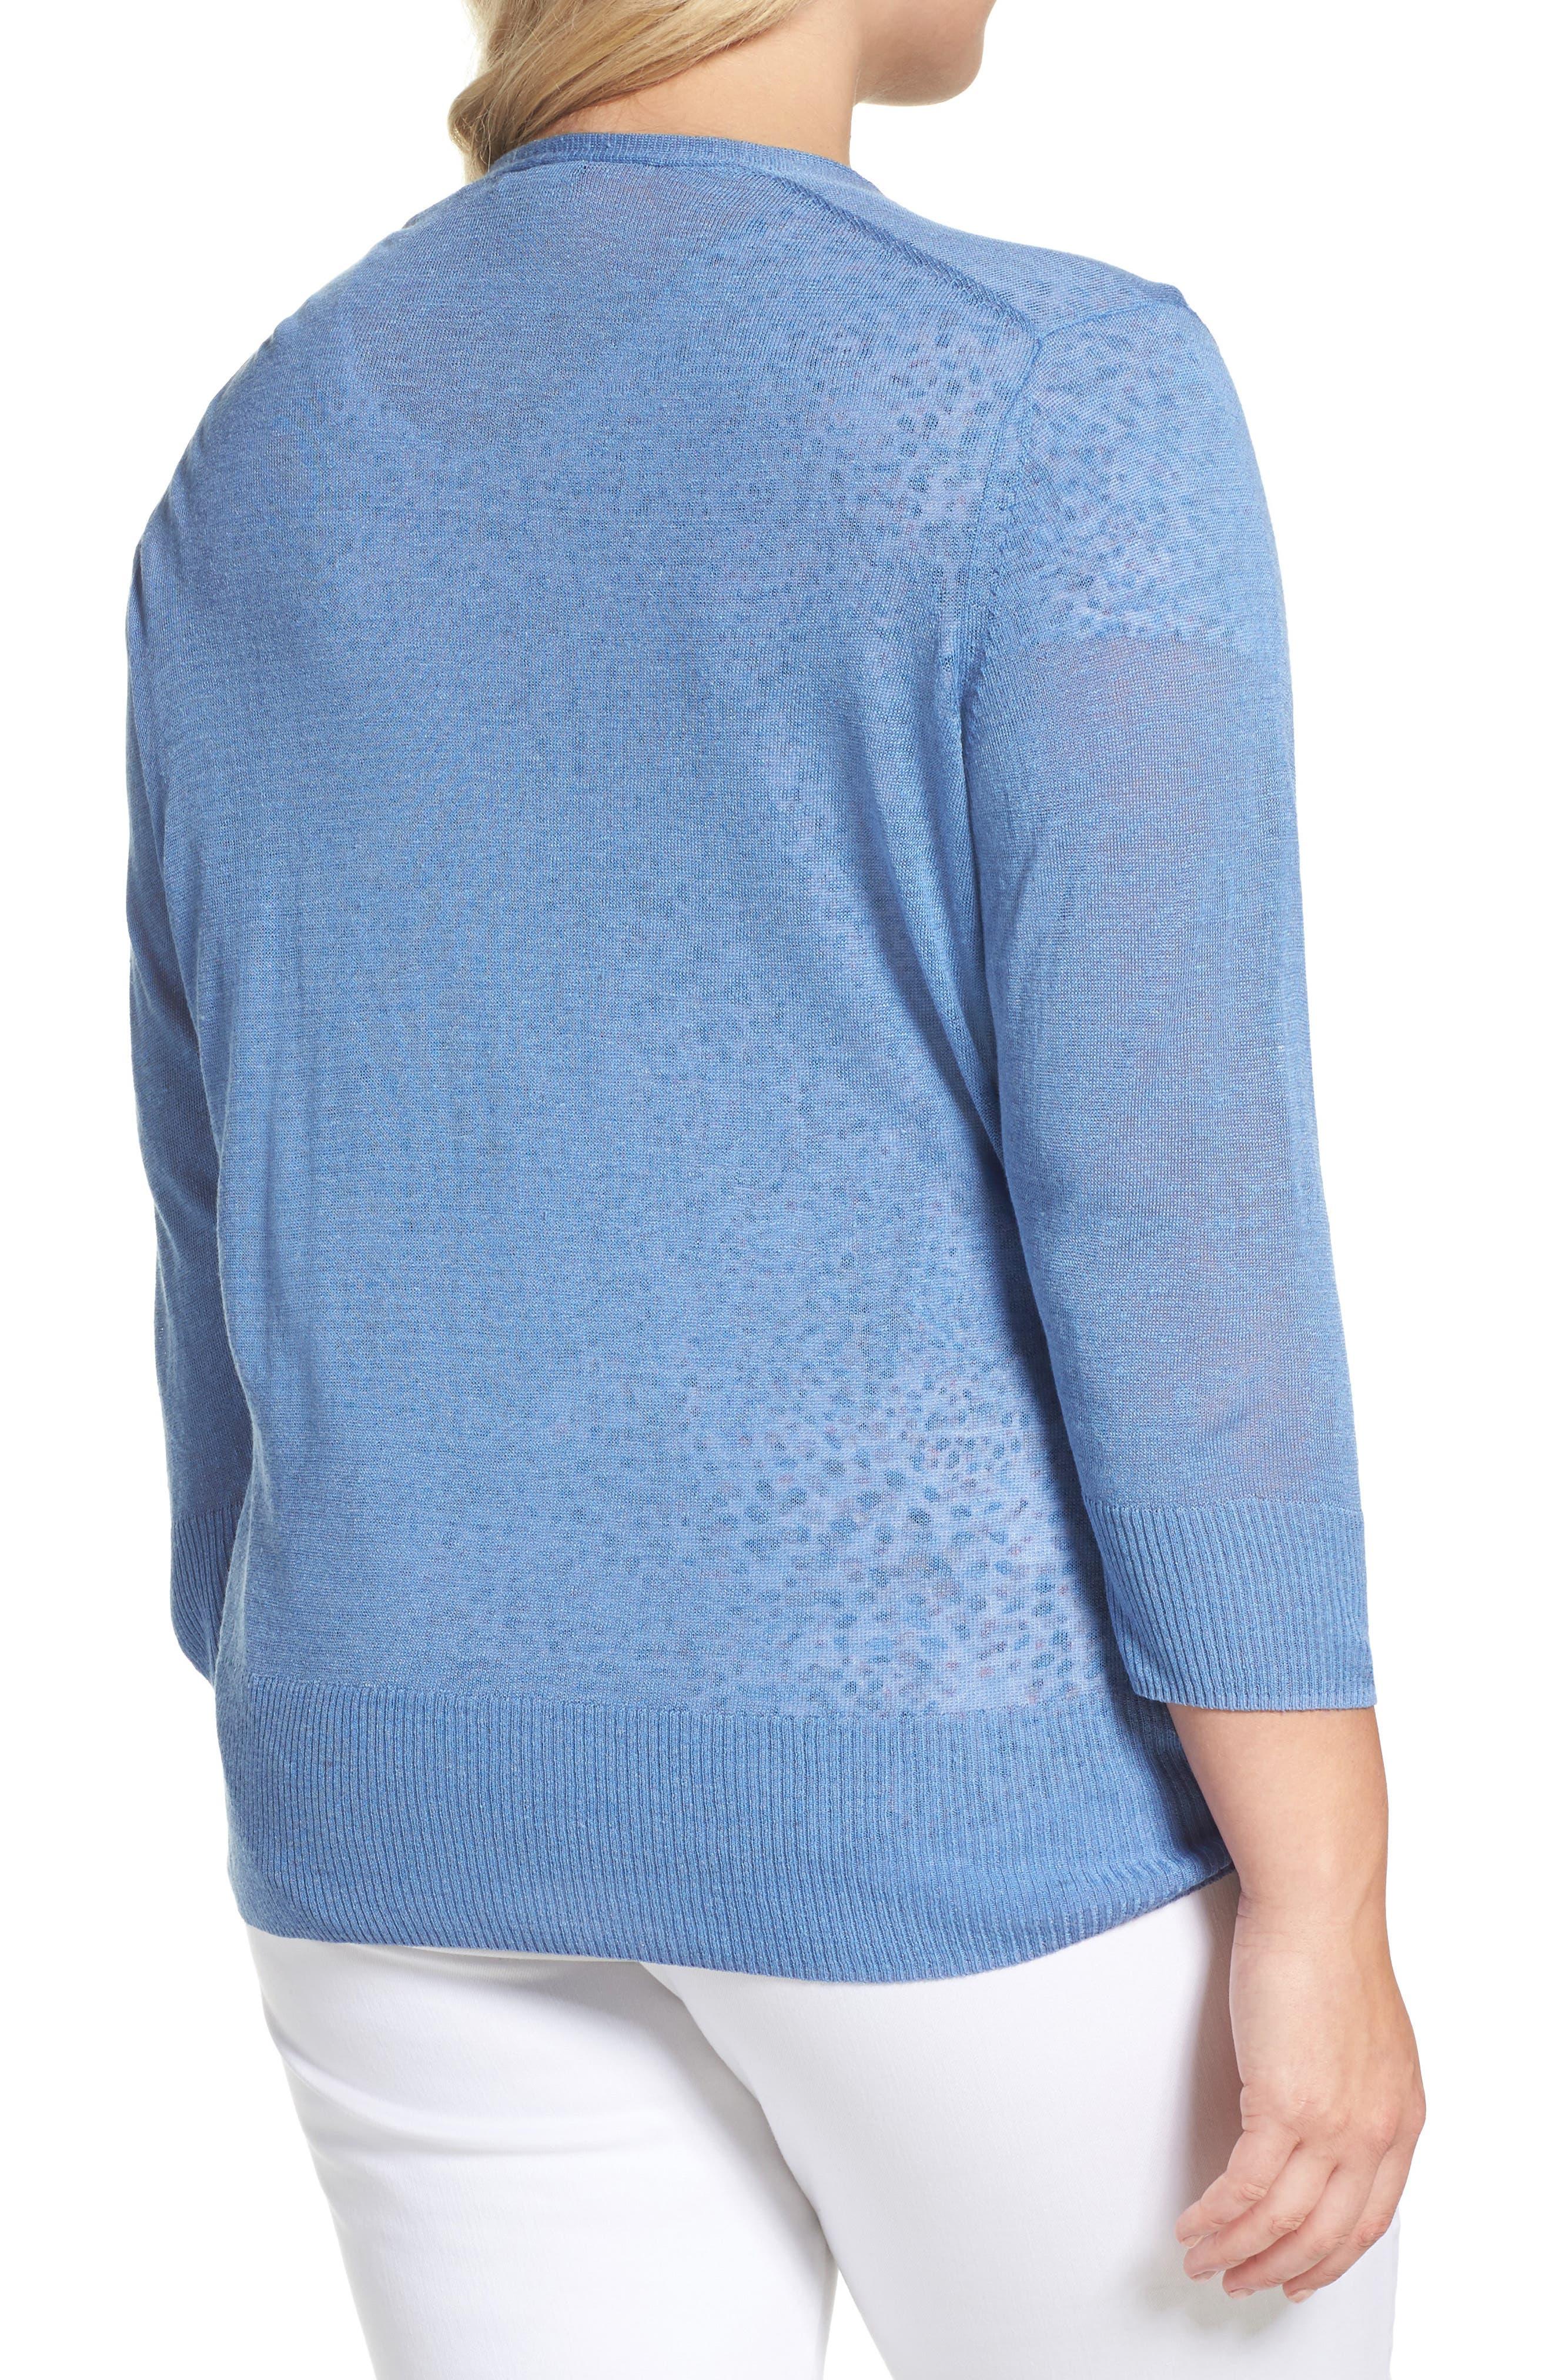 Four-Way Convertible Cardigan,                             Alternate thumbnail 2, color,                             BLUE HAZE